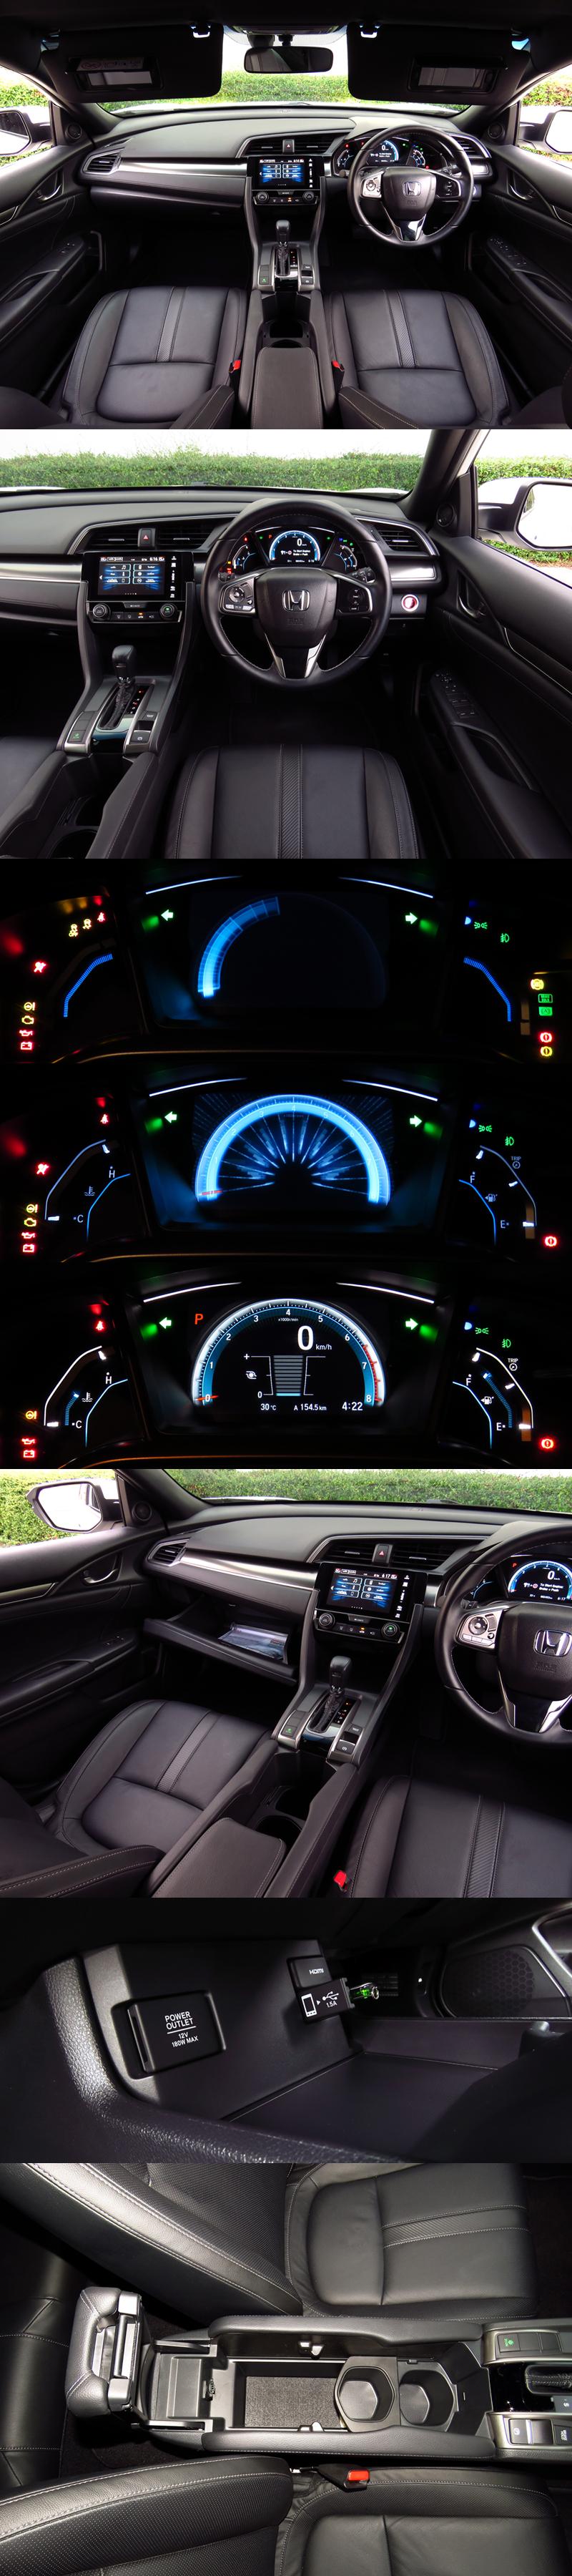 2017_04_24_Honda_Civic_Hatchback_Interior_05